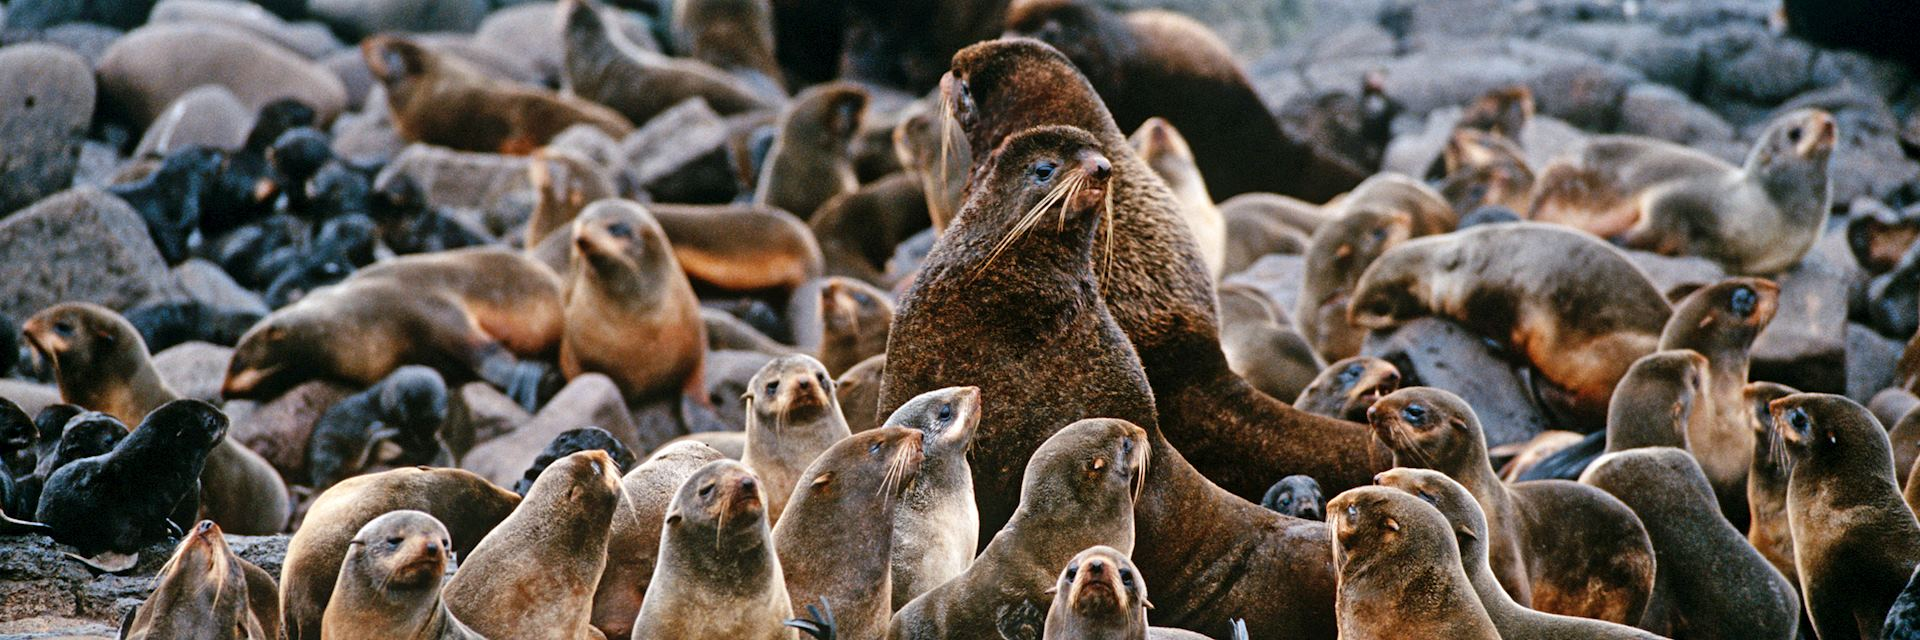 Fur seals in the Pribilof Islands, Alaska